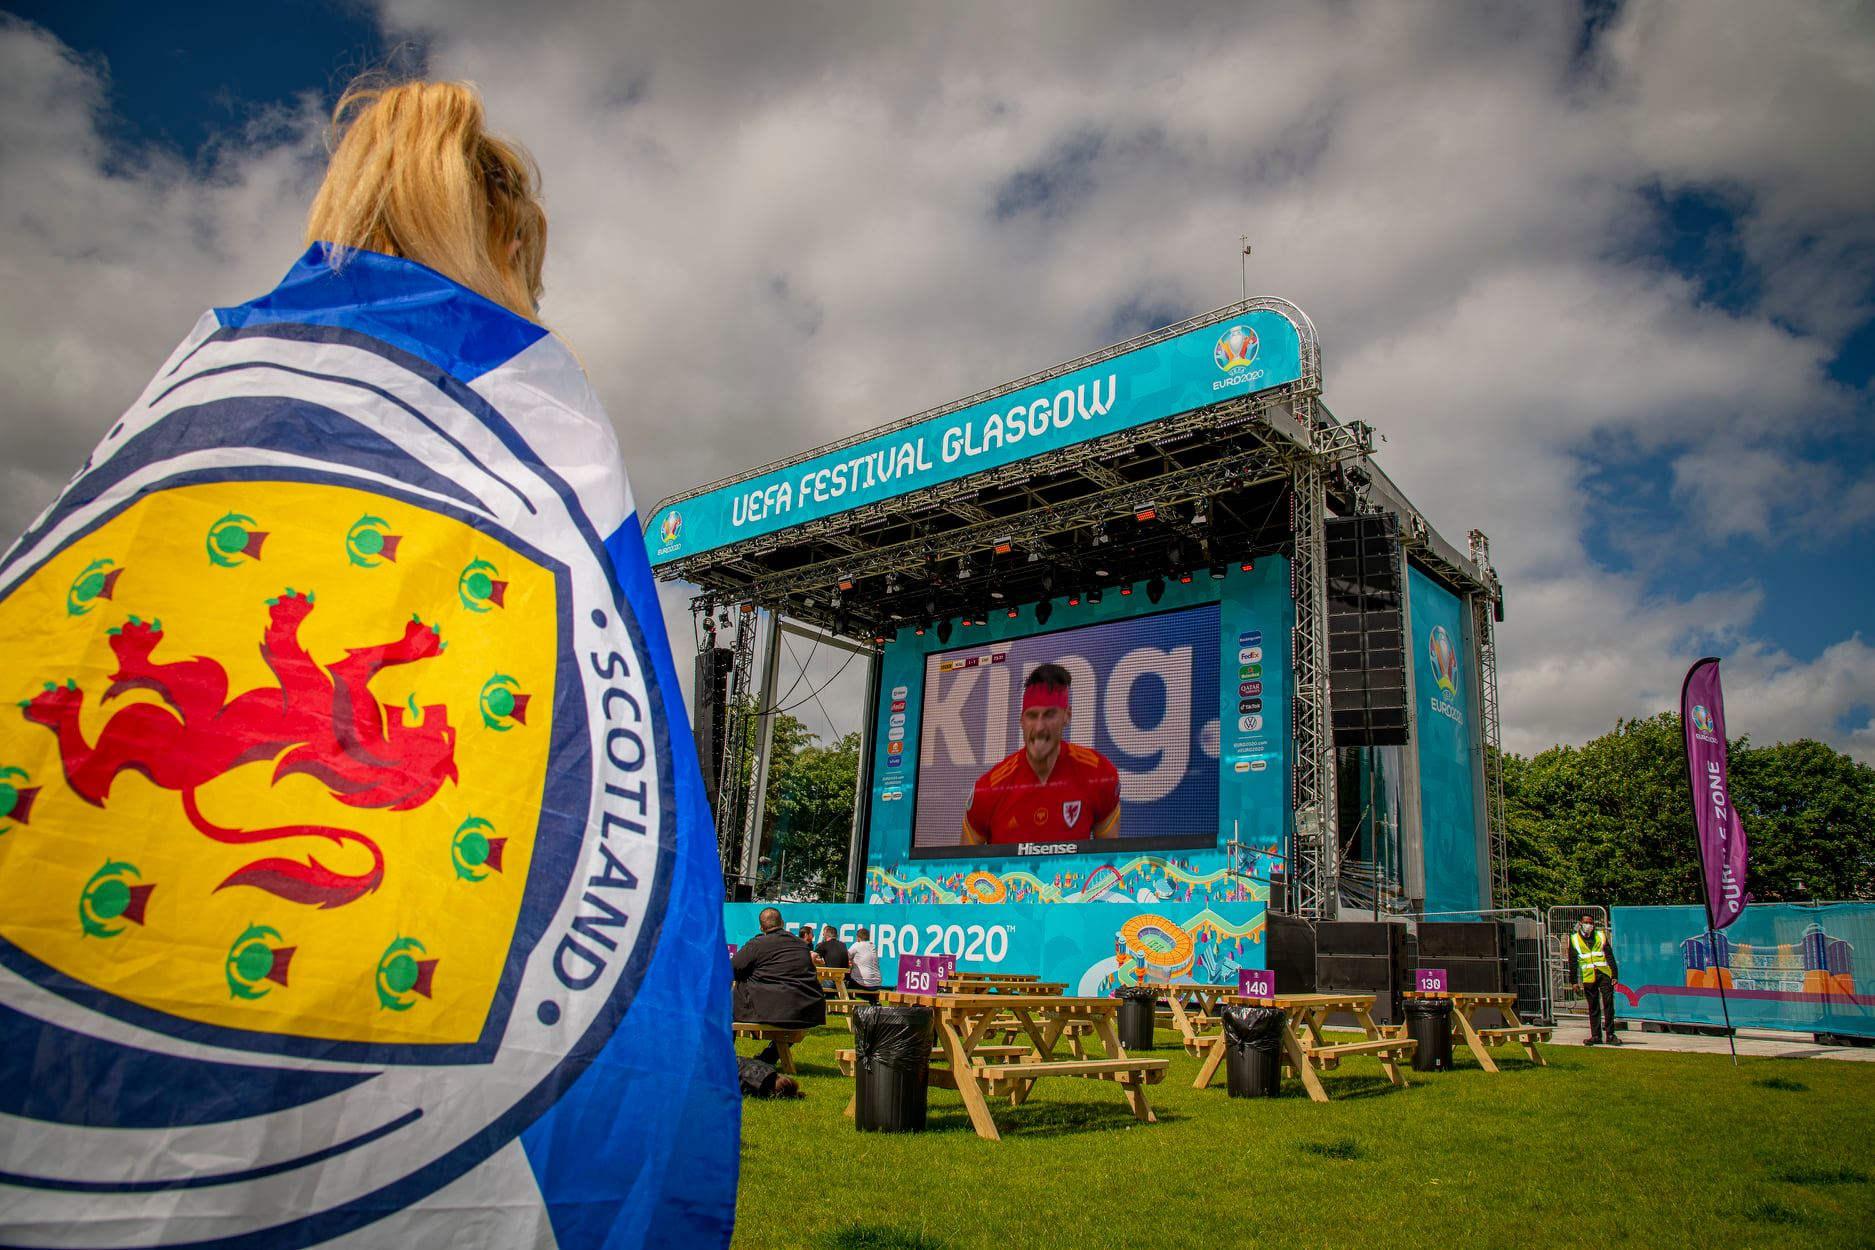 Euro 2020 fan zone stage- football news Scotland